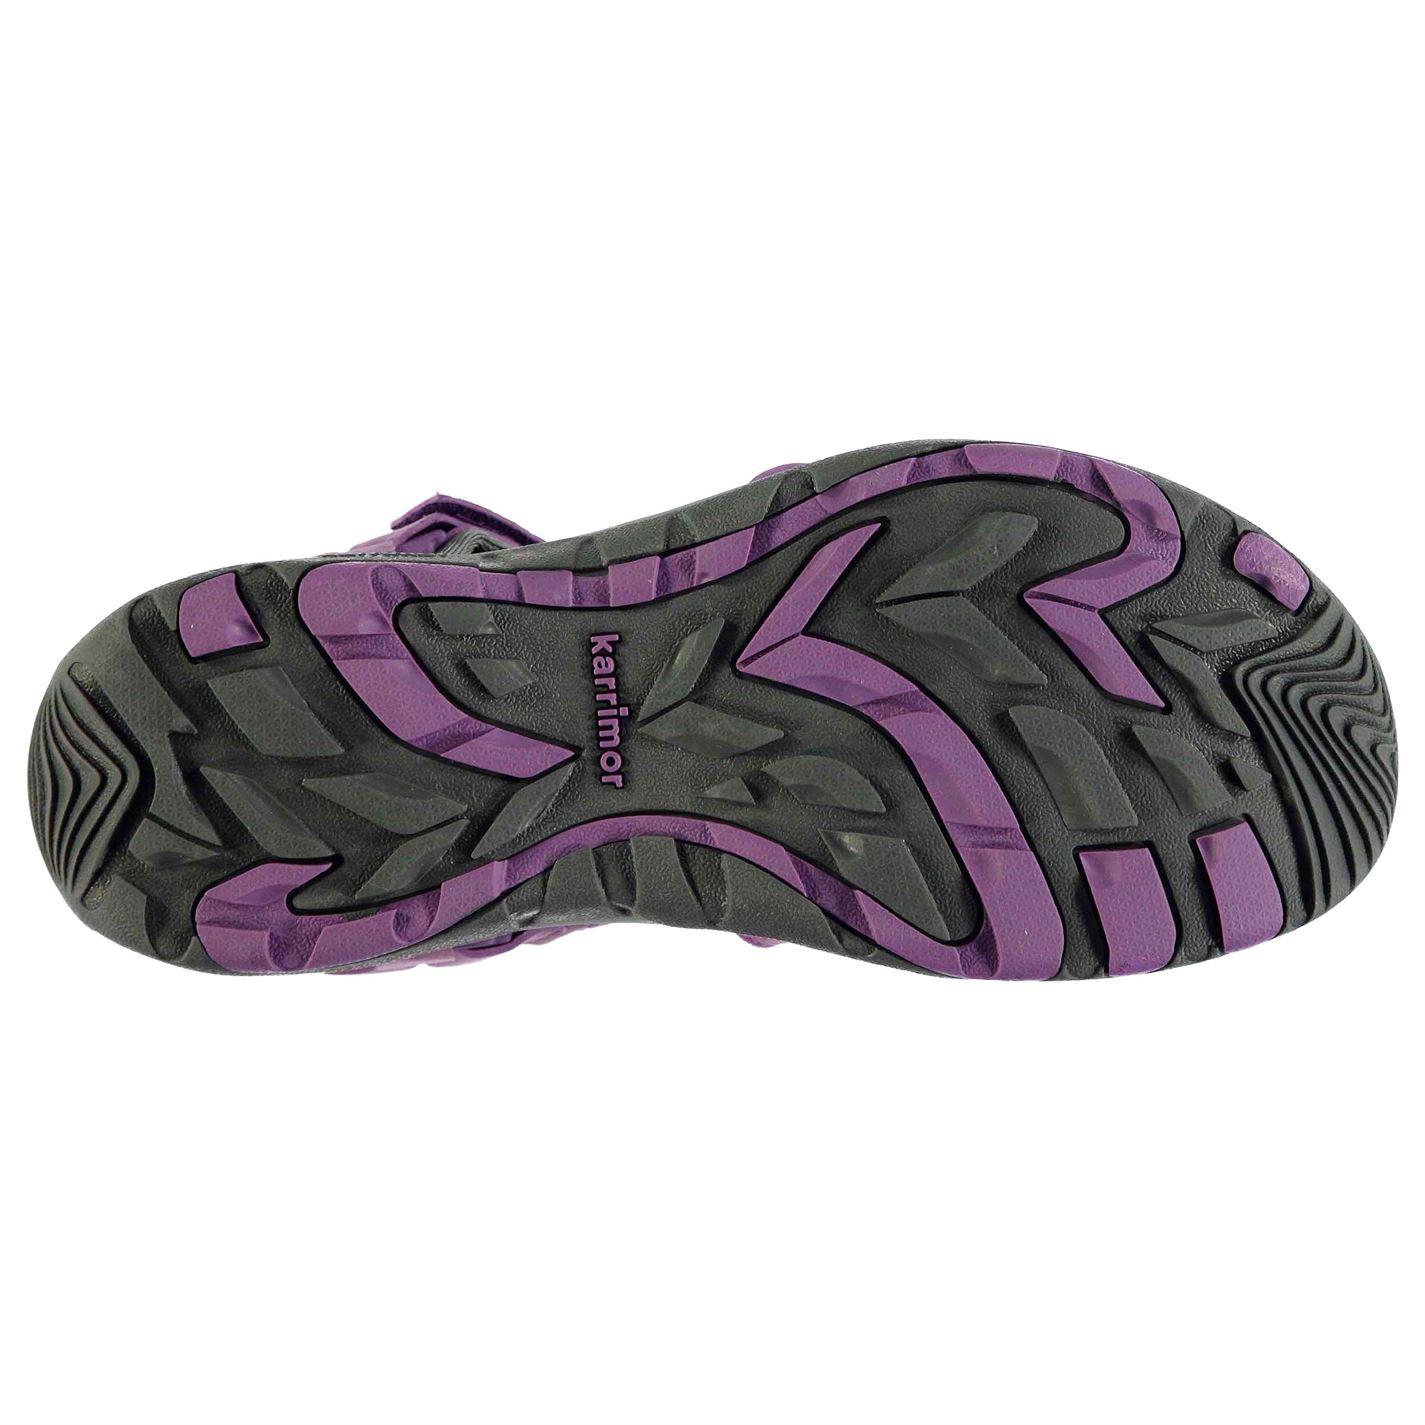 Karrimor Ladies Salina Leather Walking Sandals Shoes Footwear